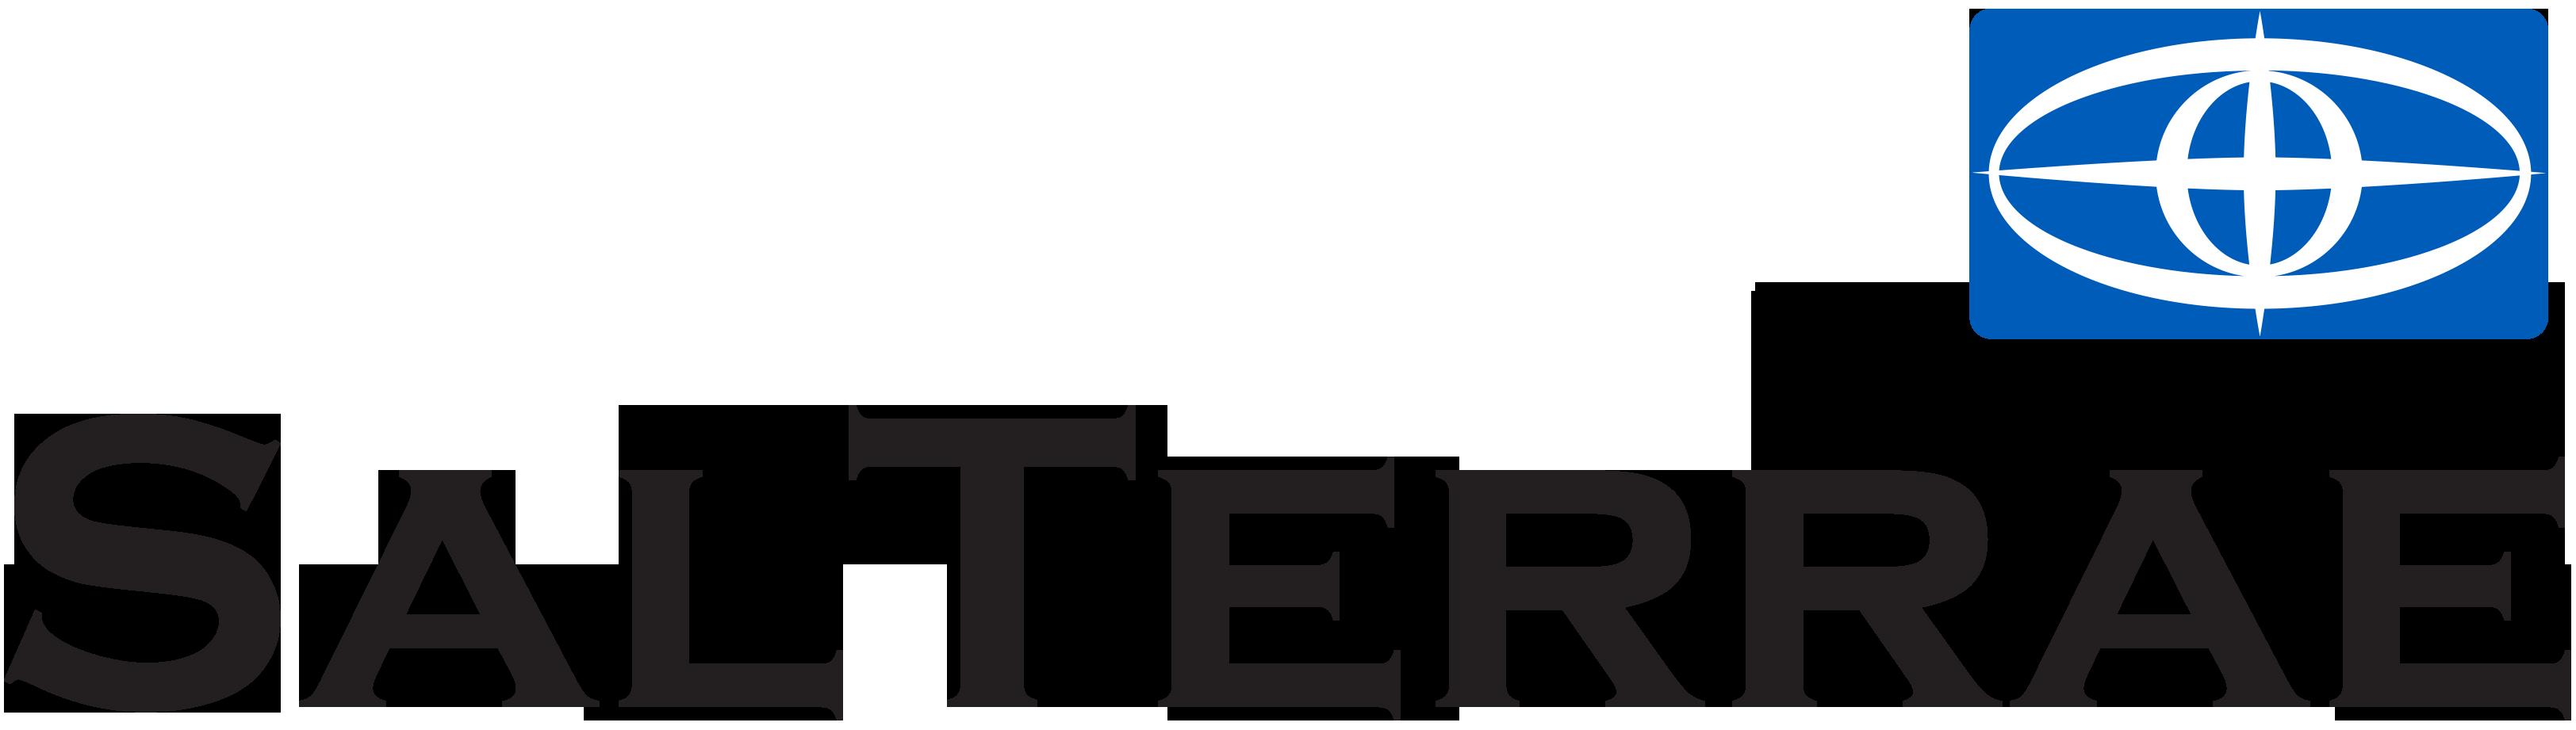 logo-ST-plano-(2)